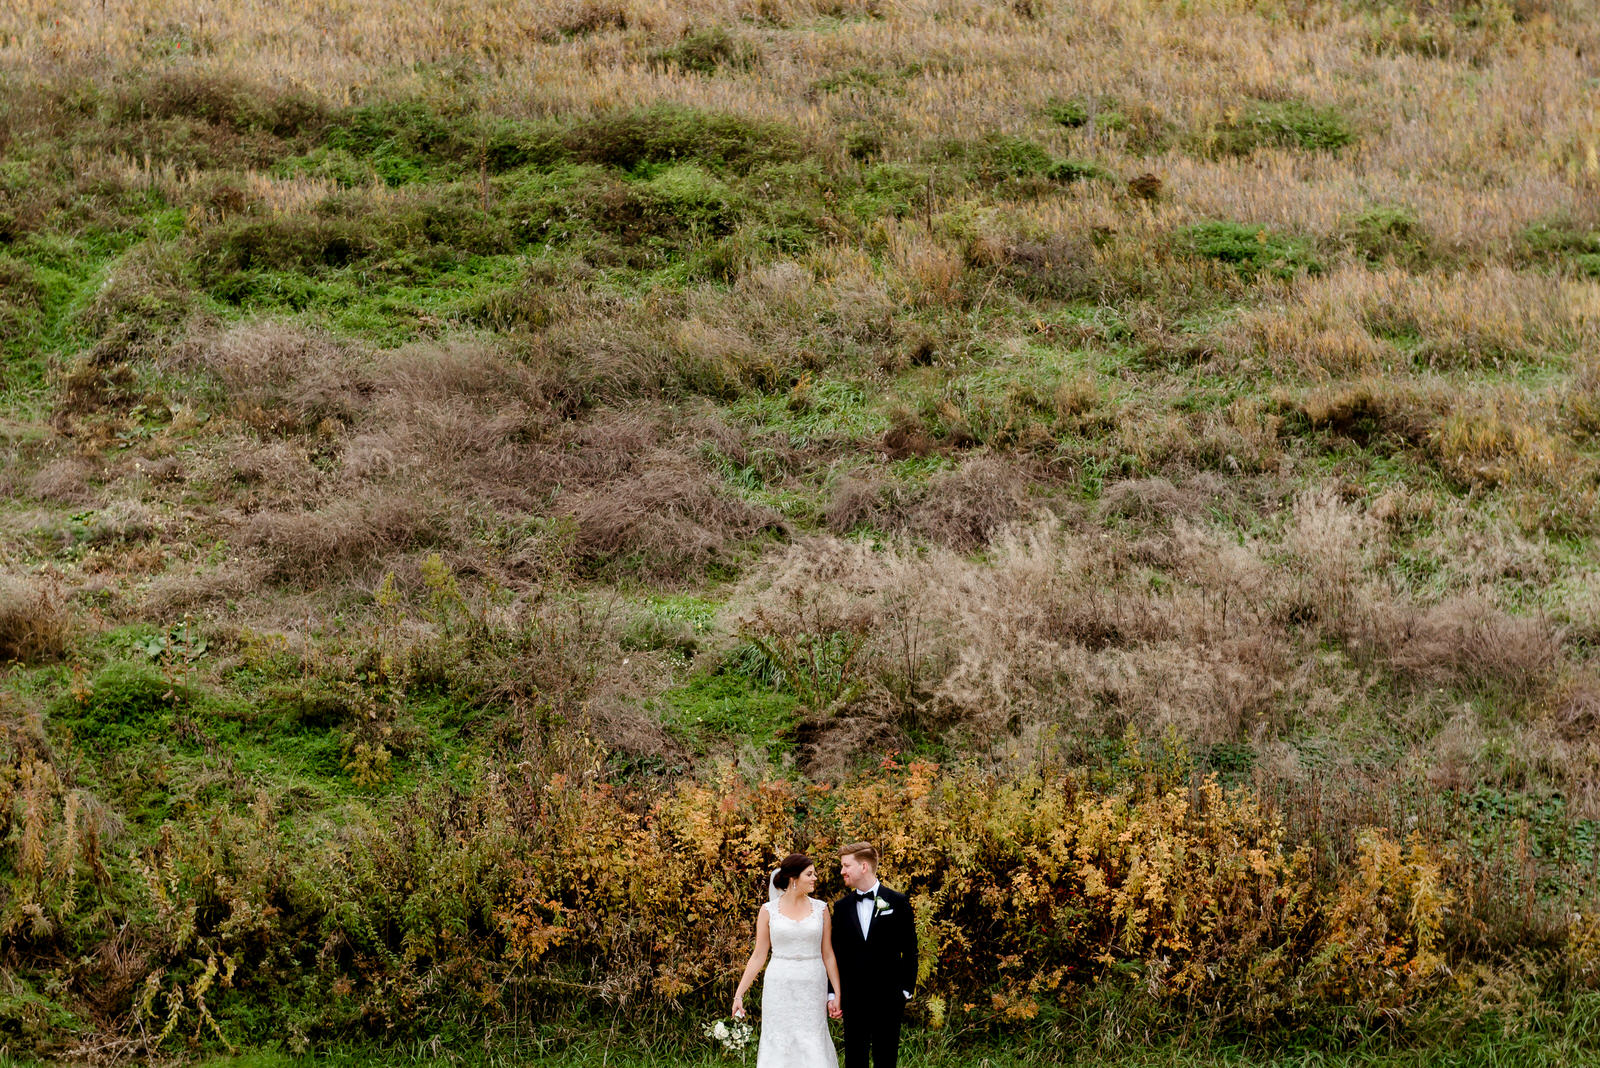 Minneapolis Wedding Photographer - Creative Bride and Groom Portrait at Mill Ruins Park